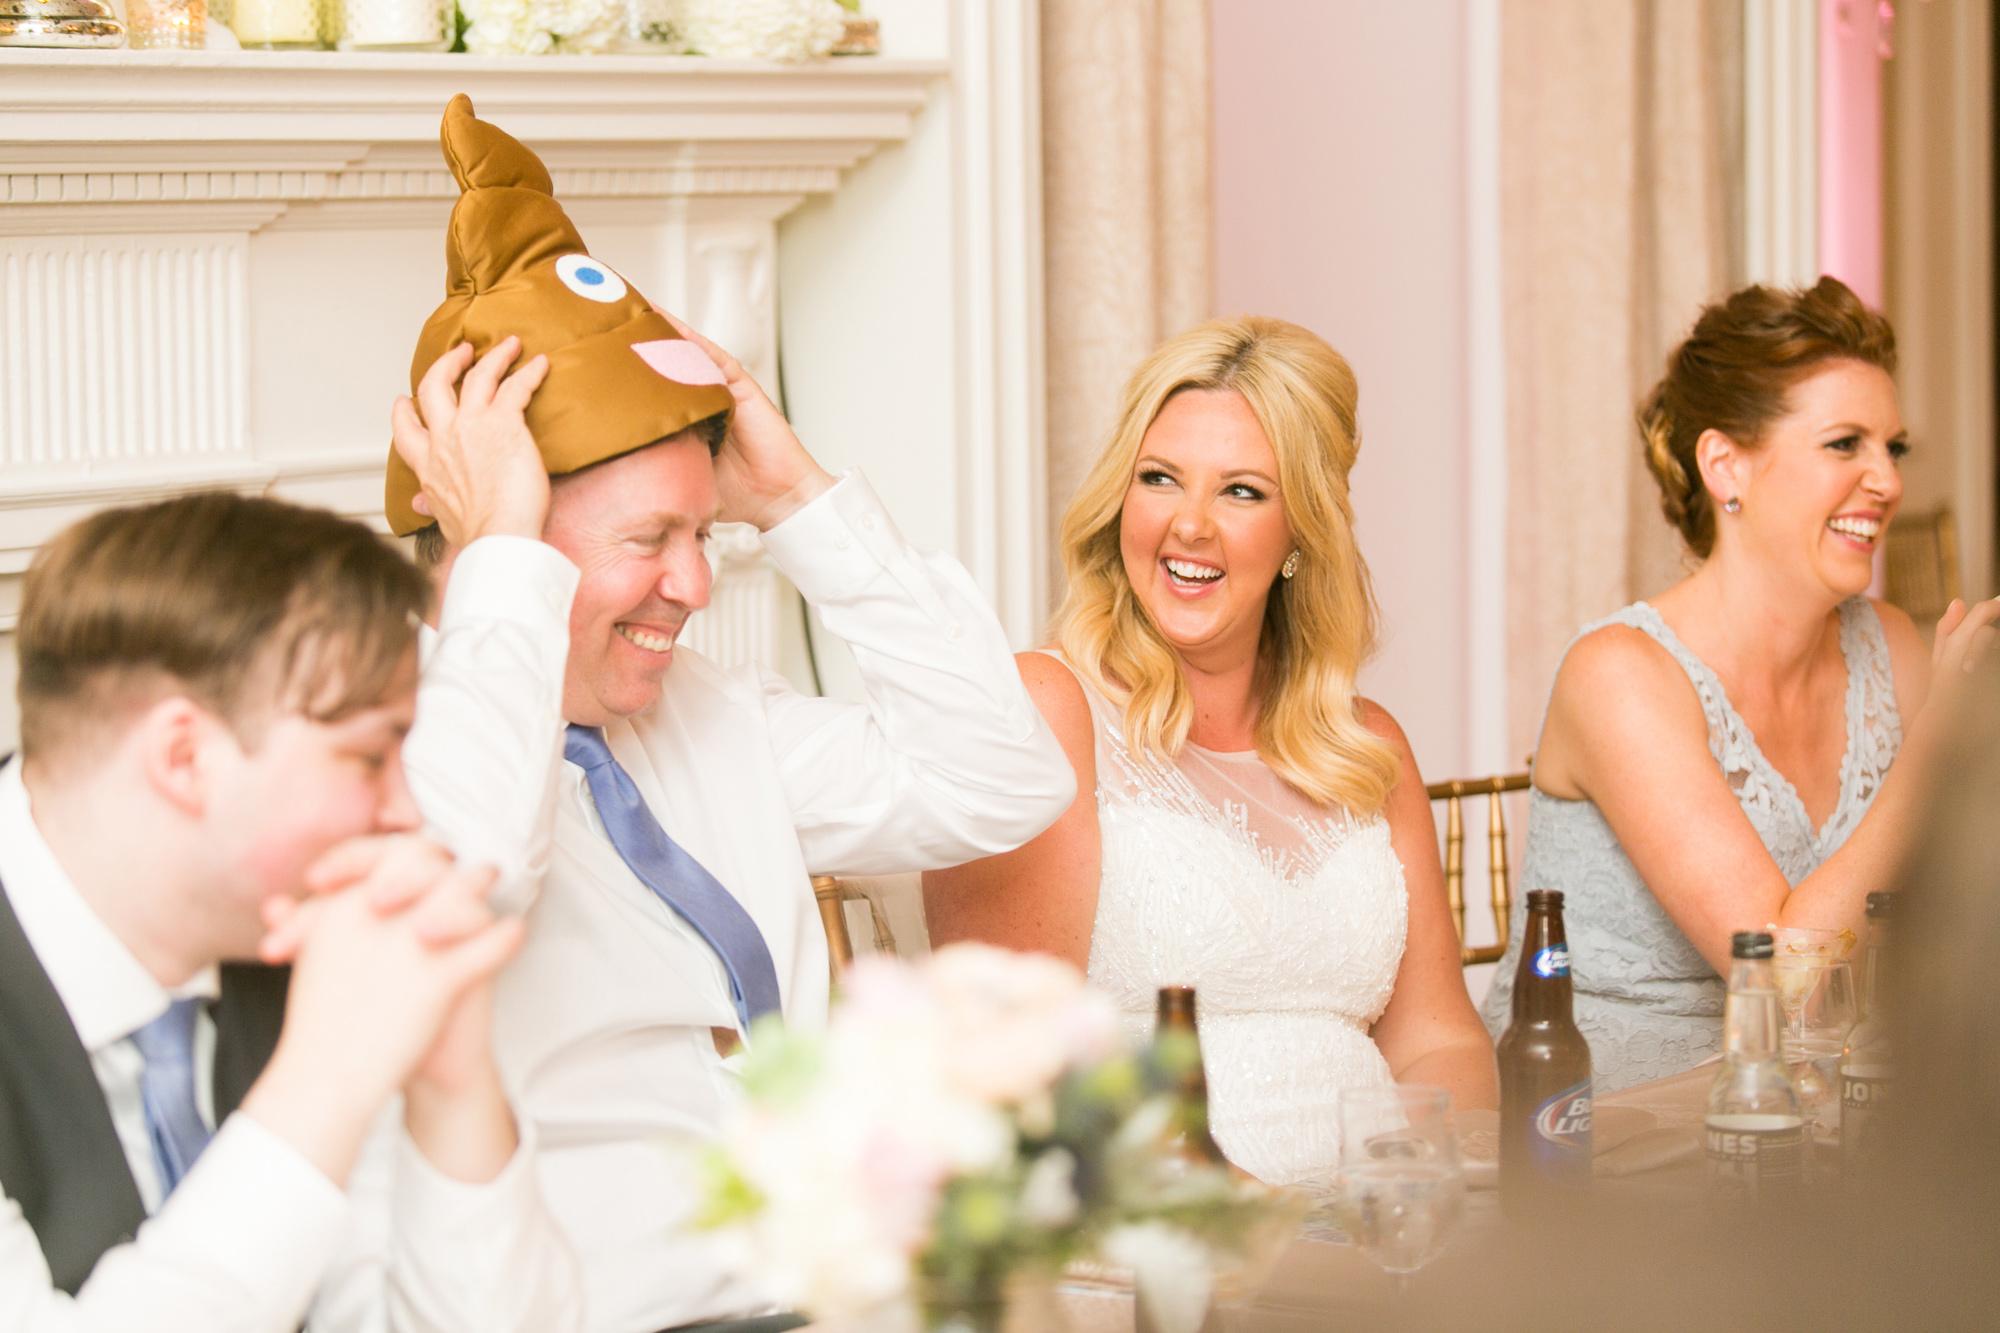 168-lord-nelson-wedding-------.jpg